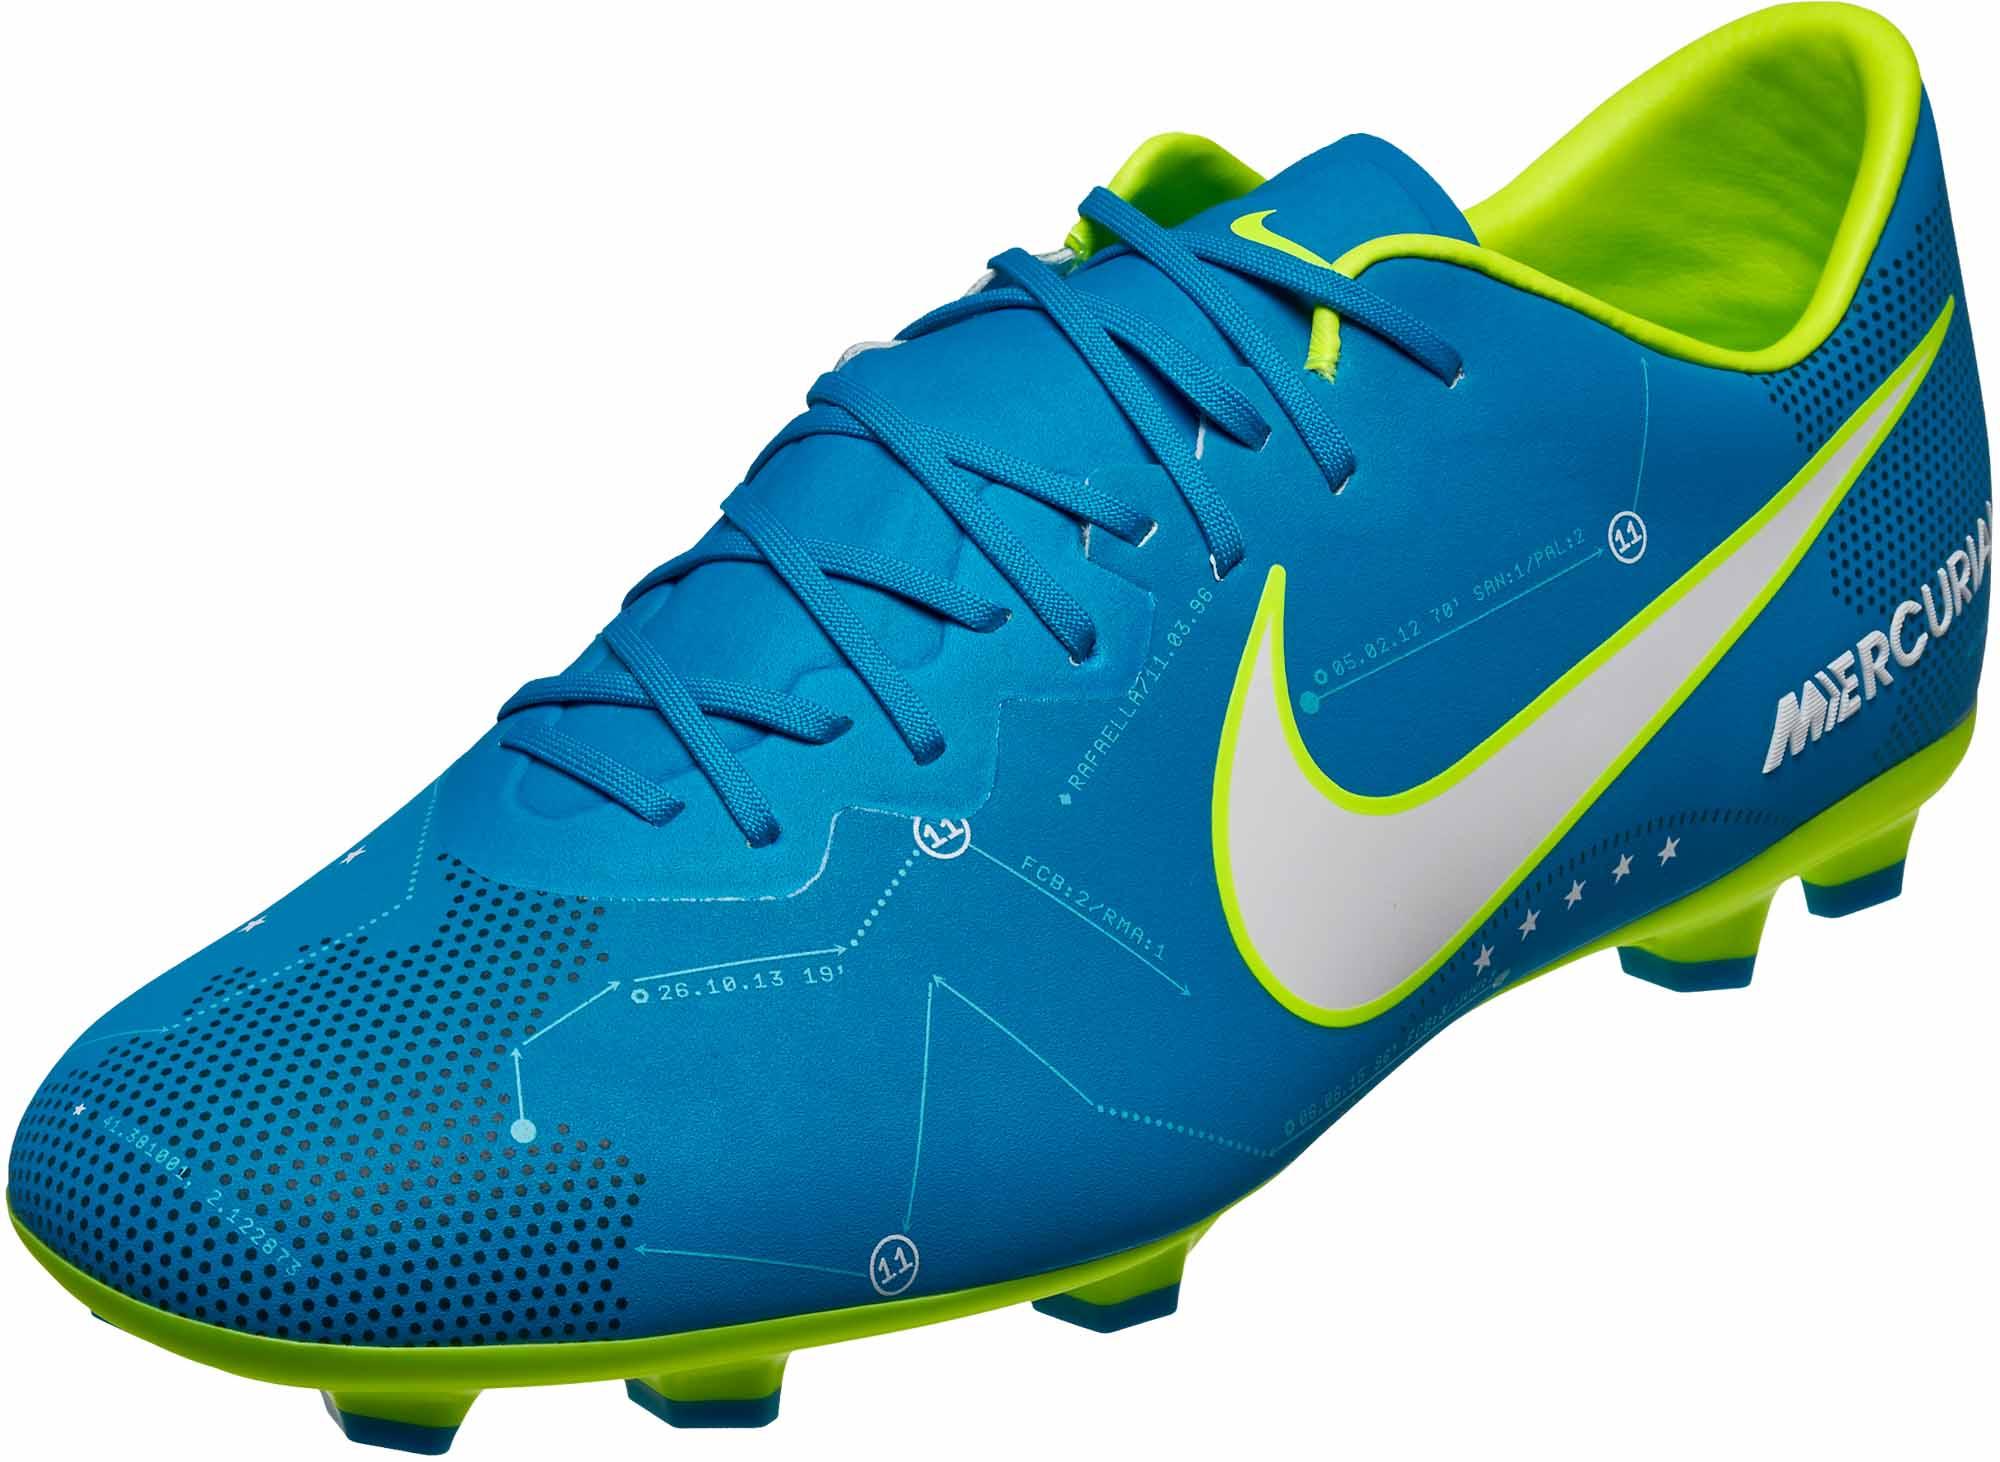 Nike Mercurial Vapor XI Neymar - Youth Nike Vapors